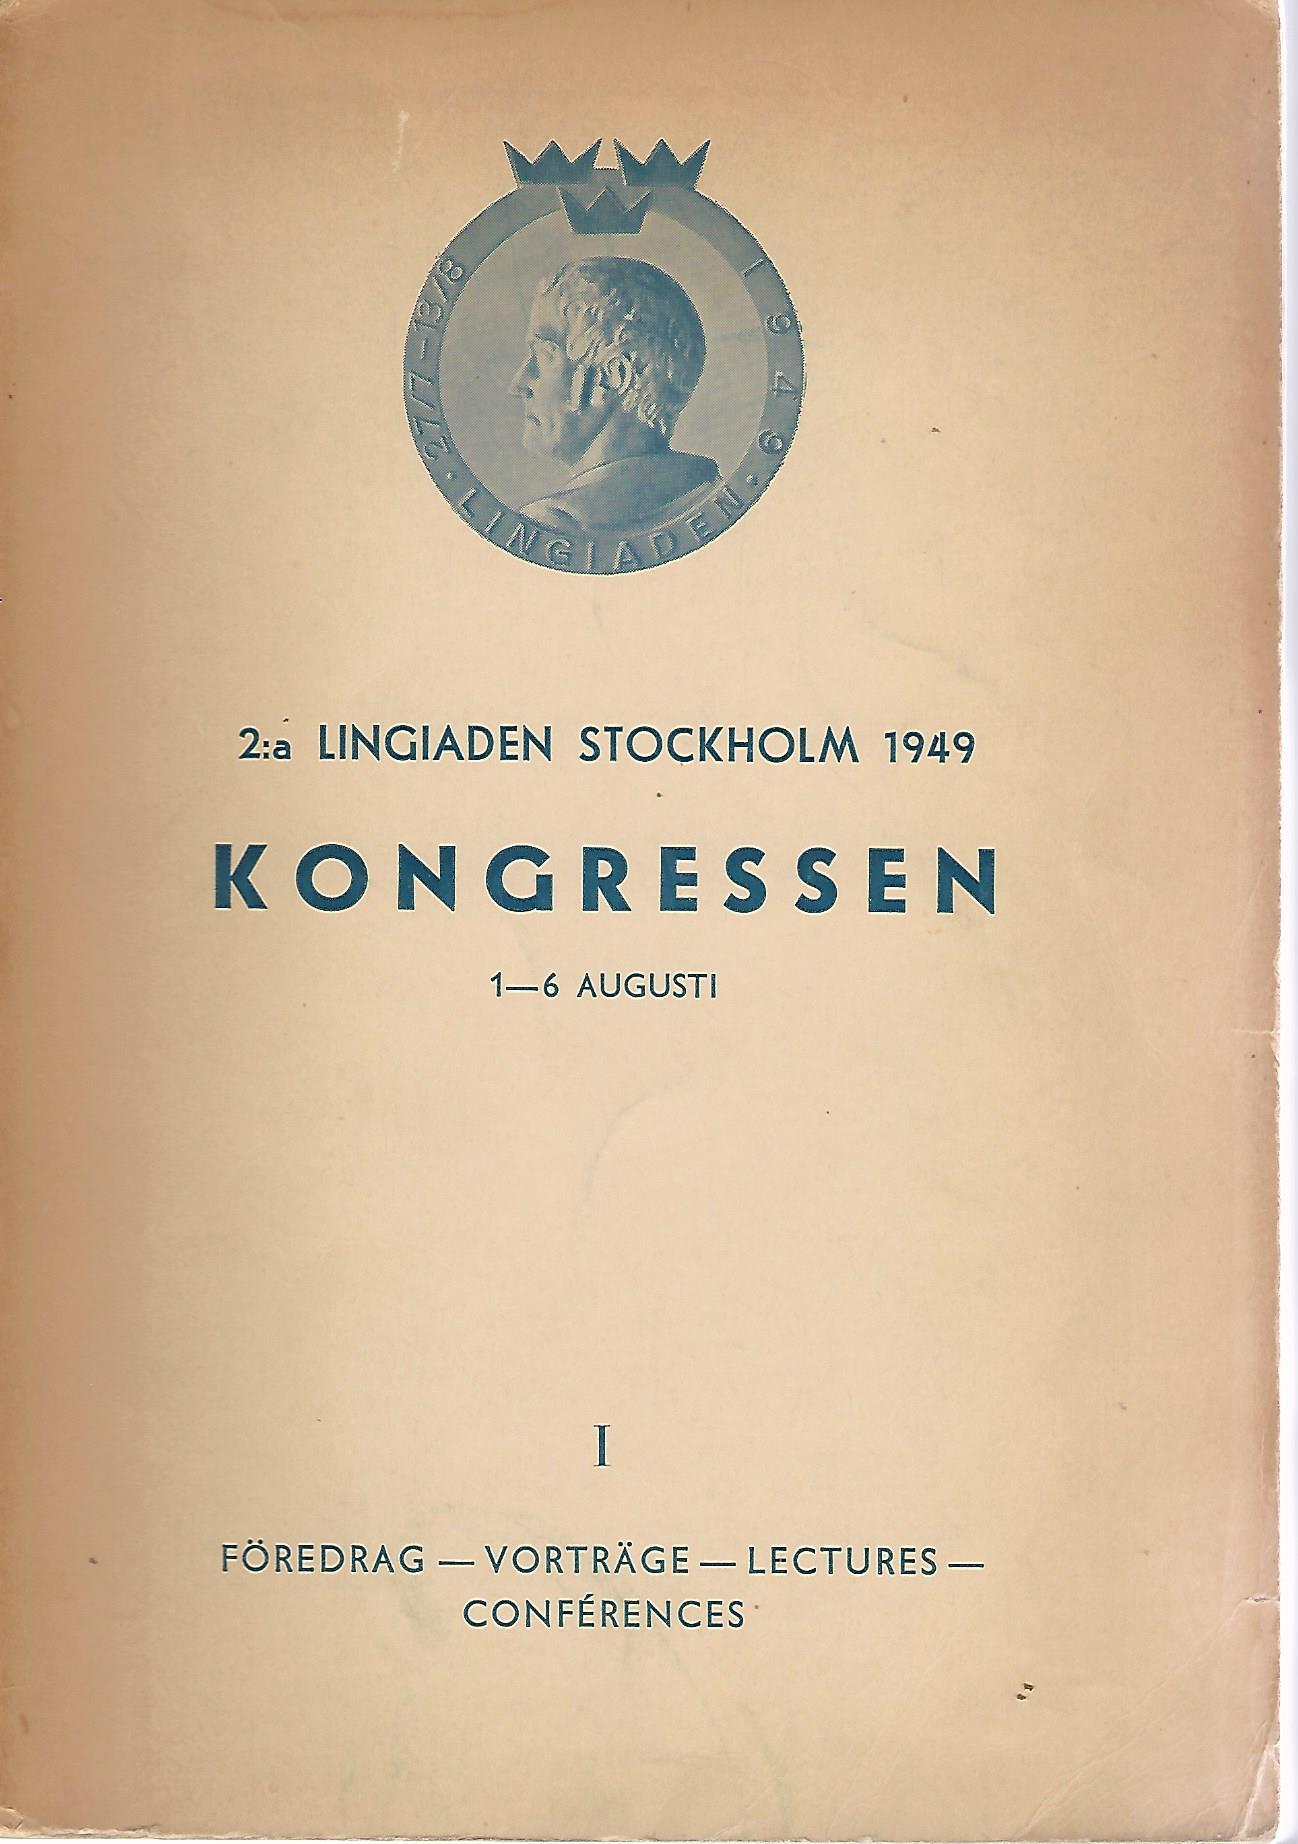 - 2:a Lingiaden Stockholm 1949 Kongressen 1-6 augusti -Föredrag - Vortráge - Lectures - Conférences